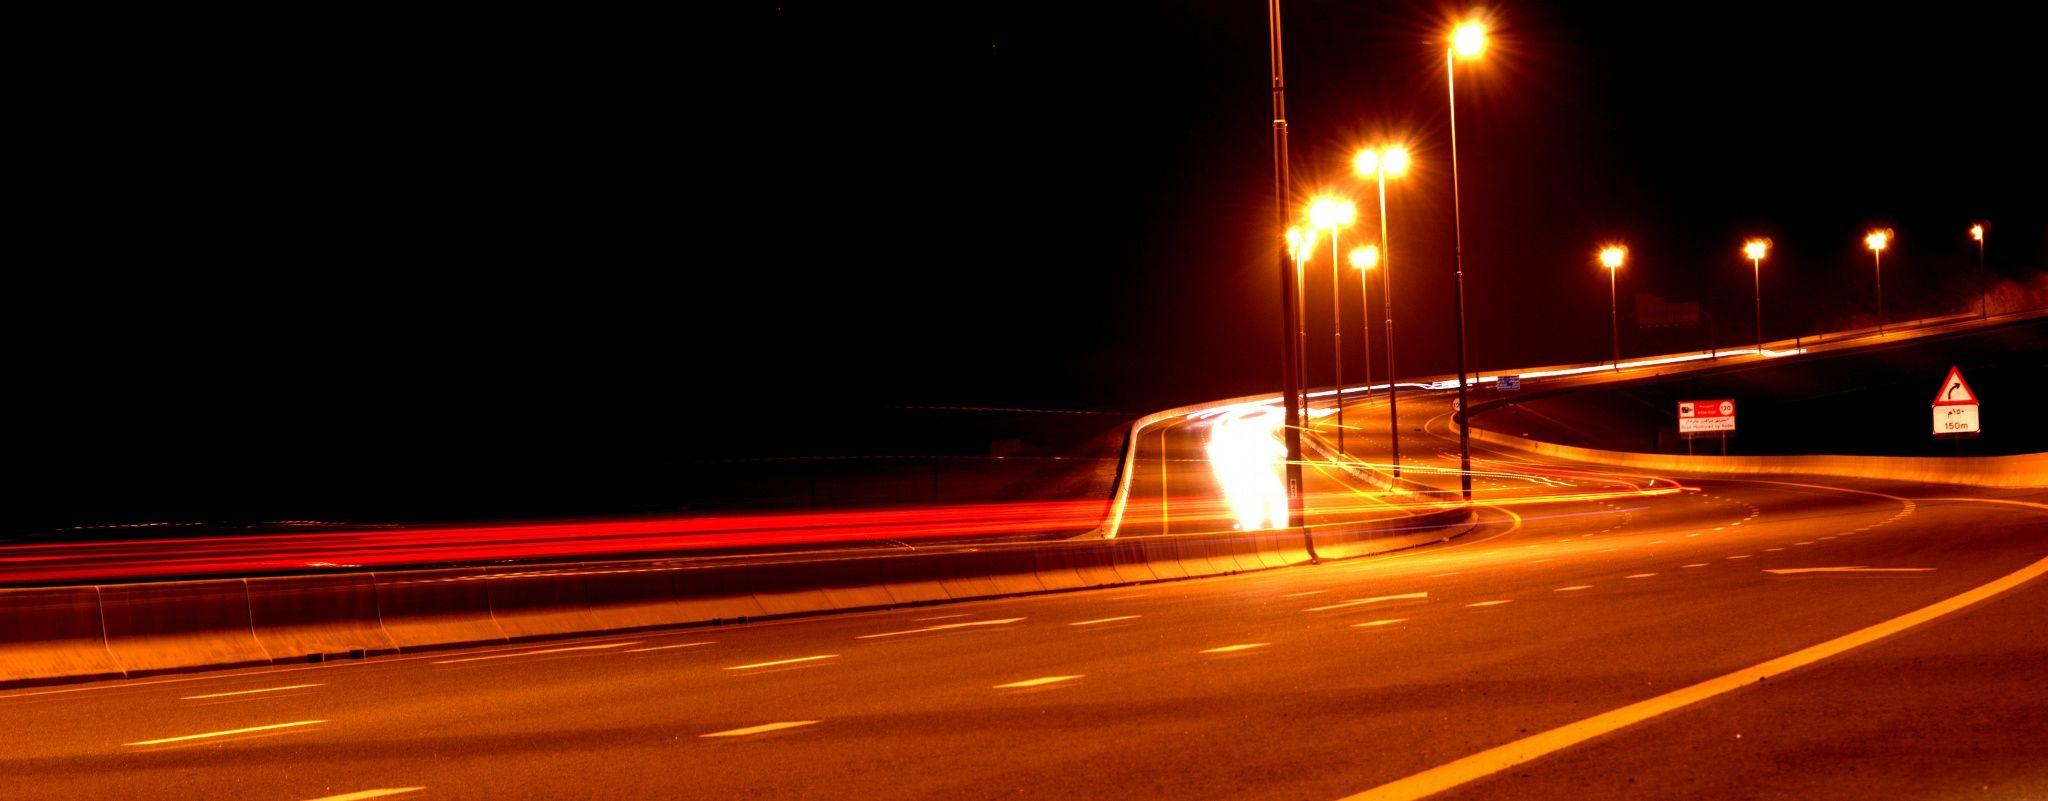 Maleha road Dubai - Sharjah Highway  Light trail Photography